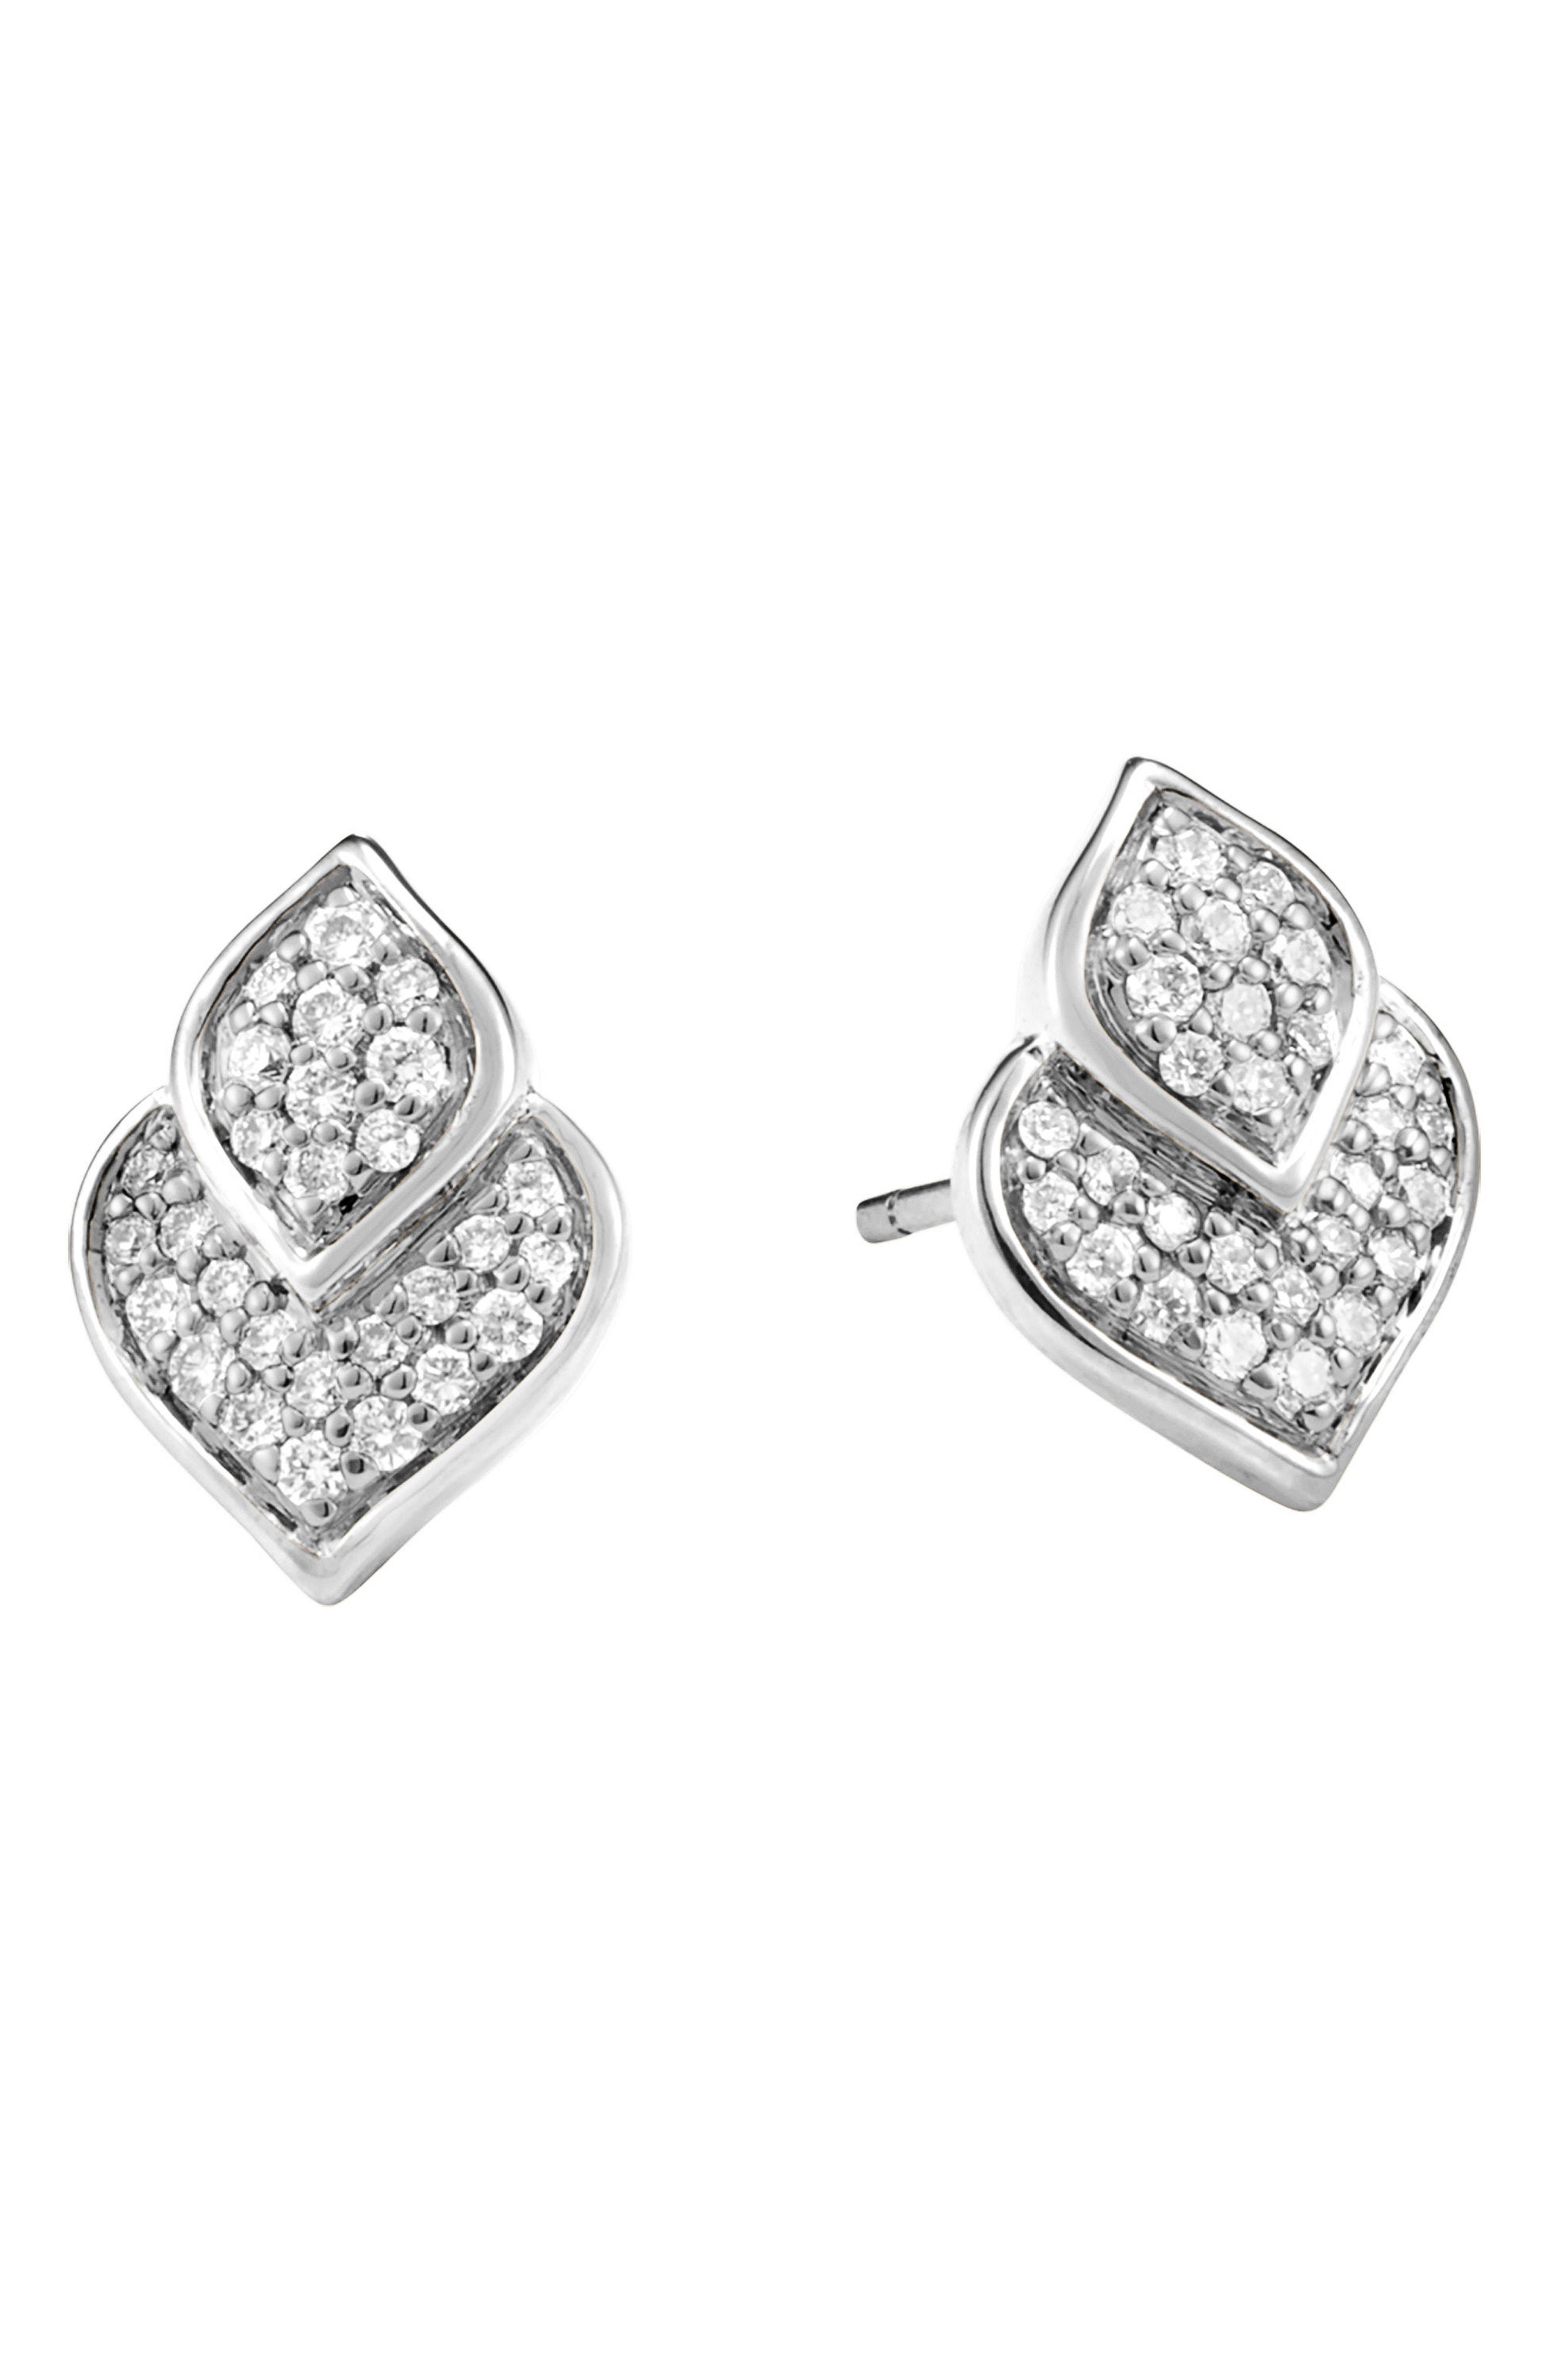 8c0899e0361 Lyst - John Hardy Legends Naga Pave Diamond Stud Earrings in Metallic